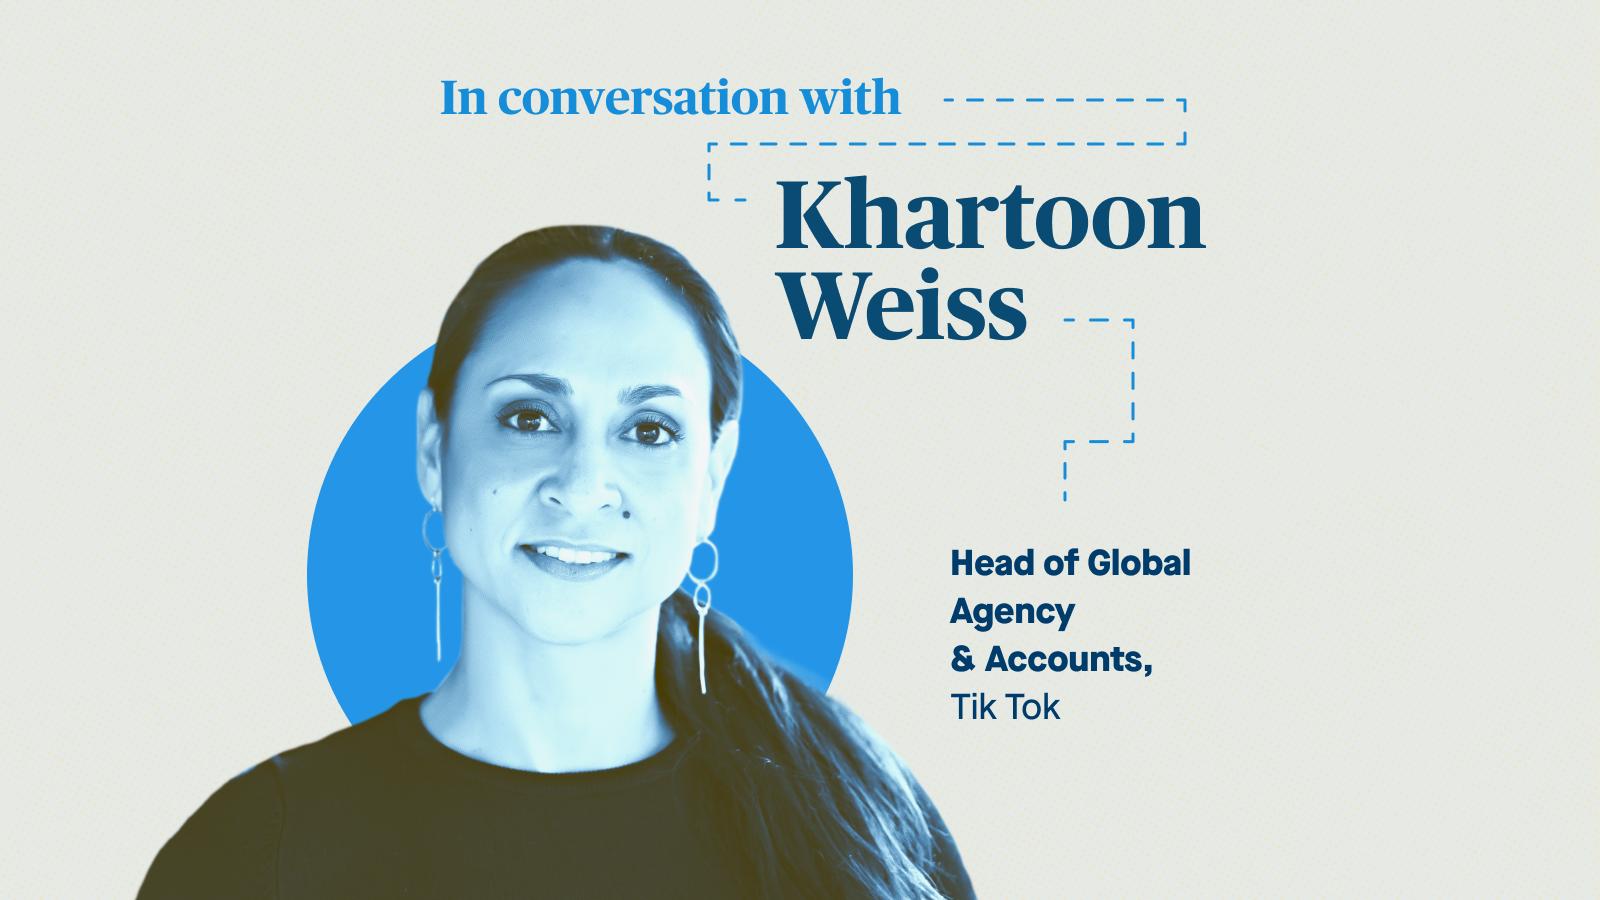 Khartoon Weiss, Head of Global Agency & Accounts, Tik Tok